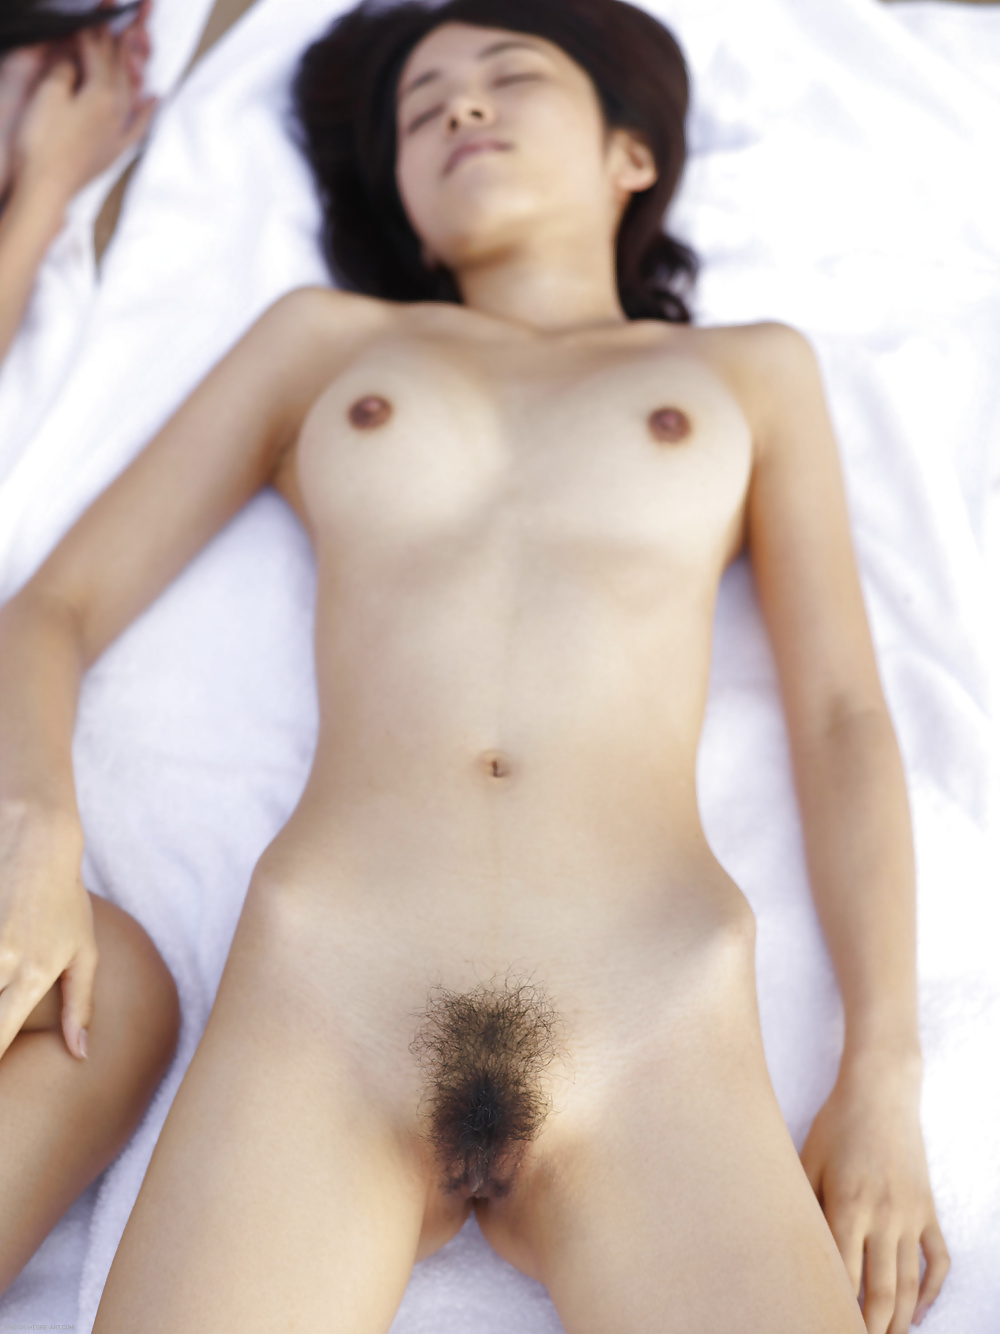 Lulu nudes